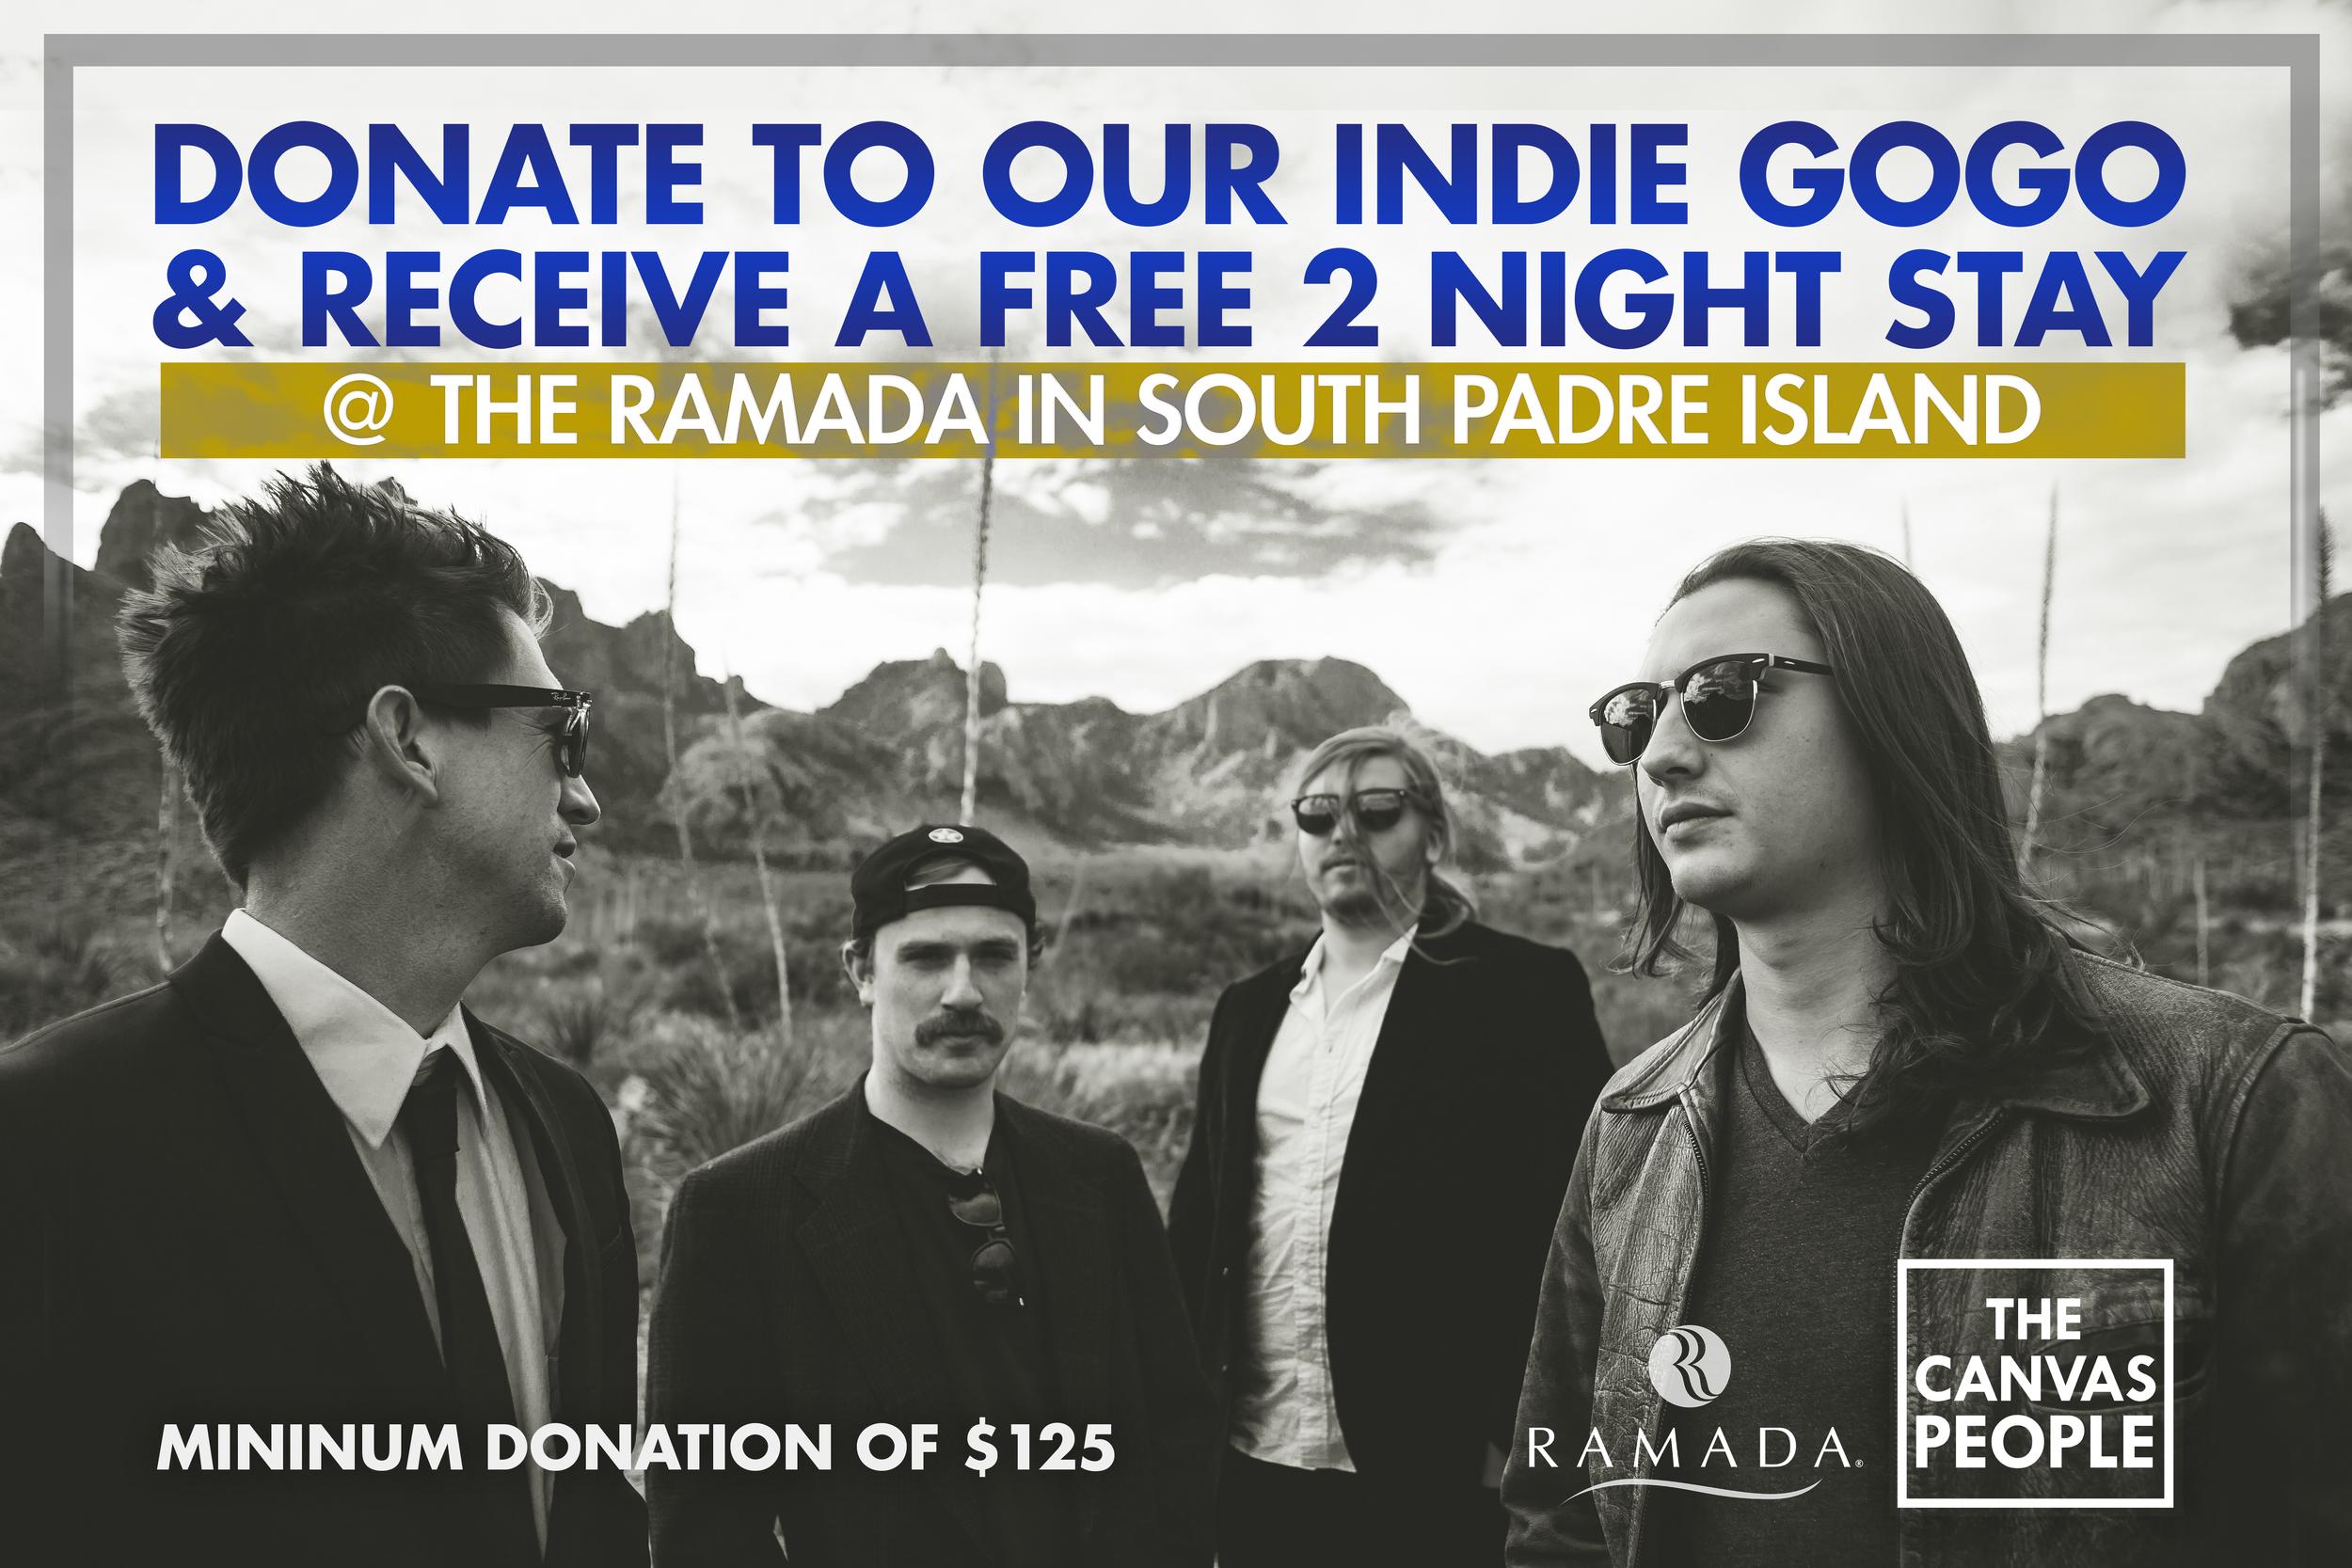 Indie Gogo Fundraiser + South Padre Island 4 w_ramada.jpg